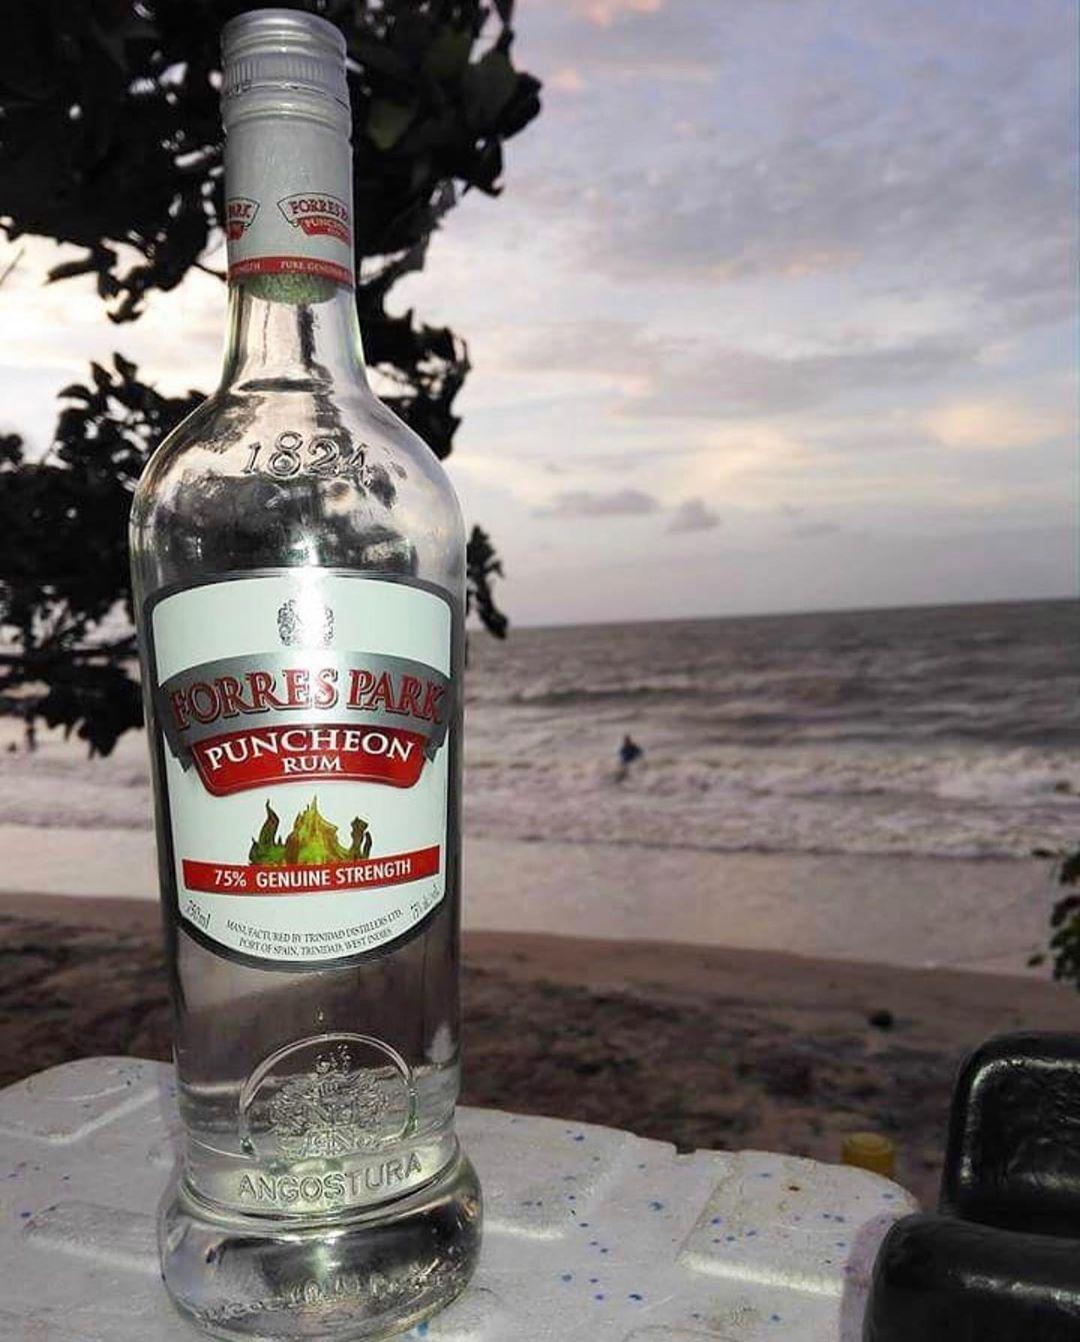 Forres Park Puncheon Rum Forrespark Instagram Analytics By Analisa Io